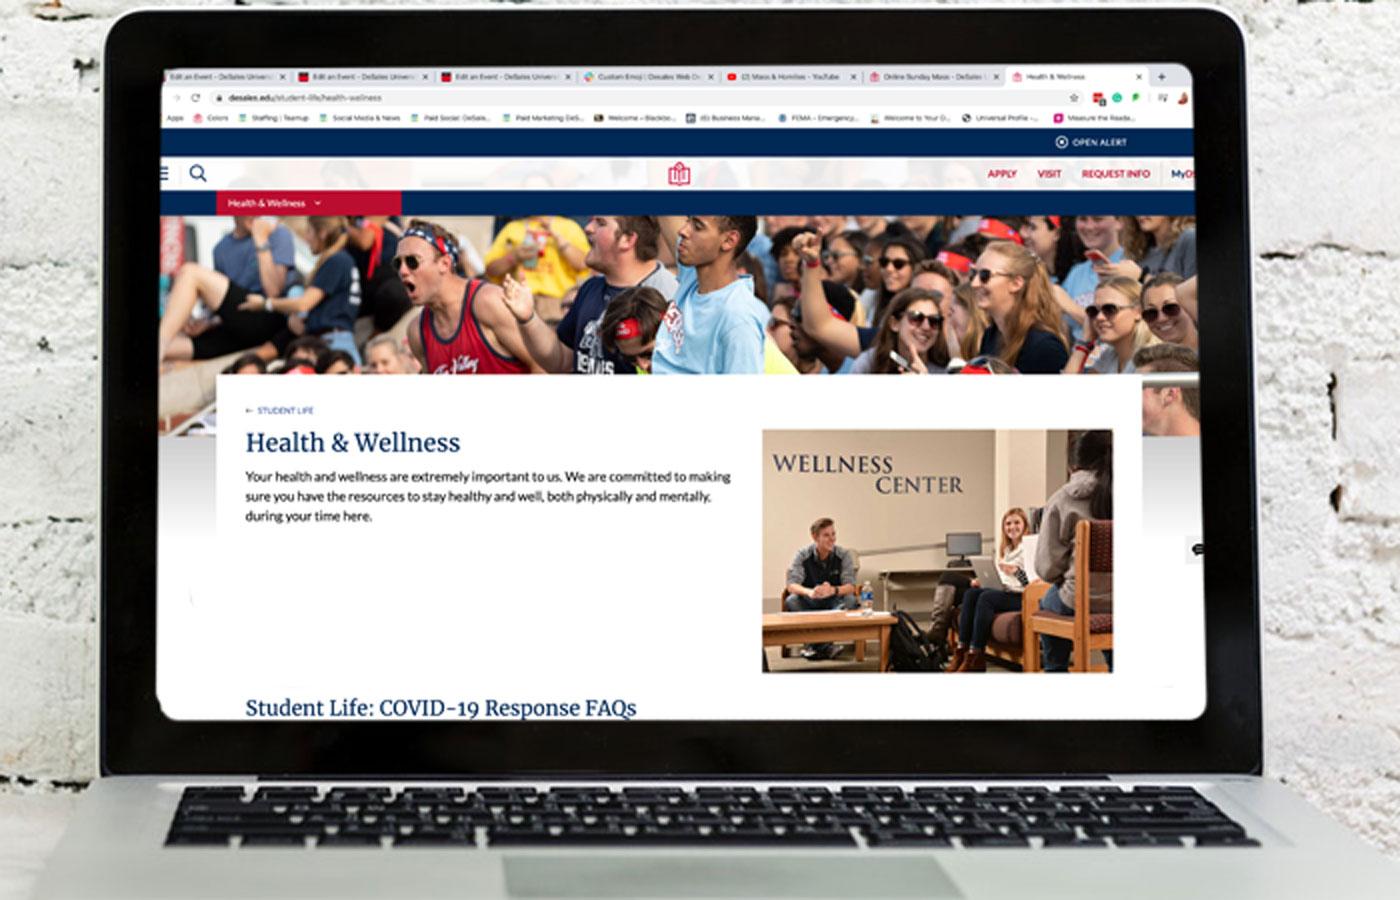 DeSales Wellness Center website displayed on a Laptop